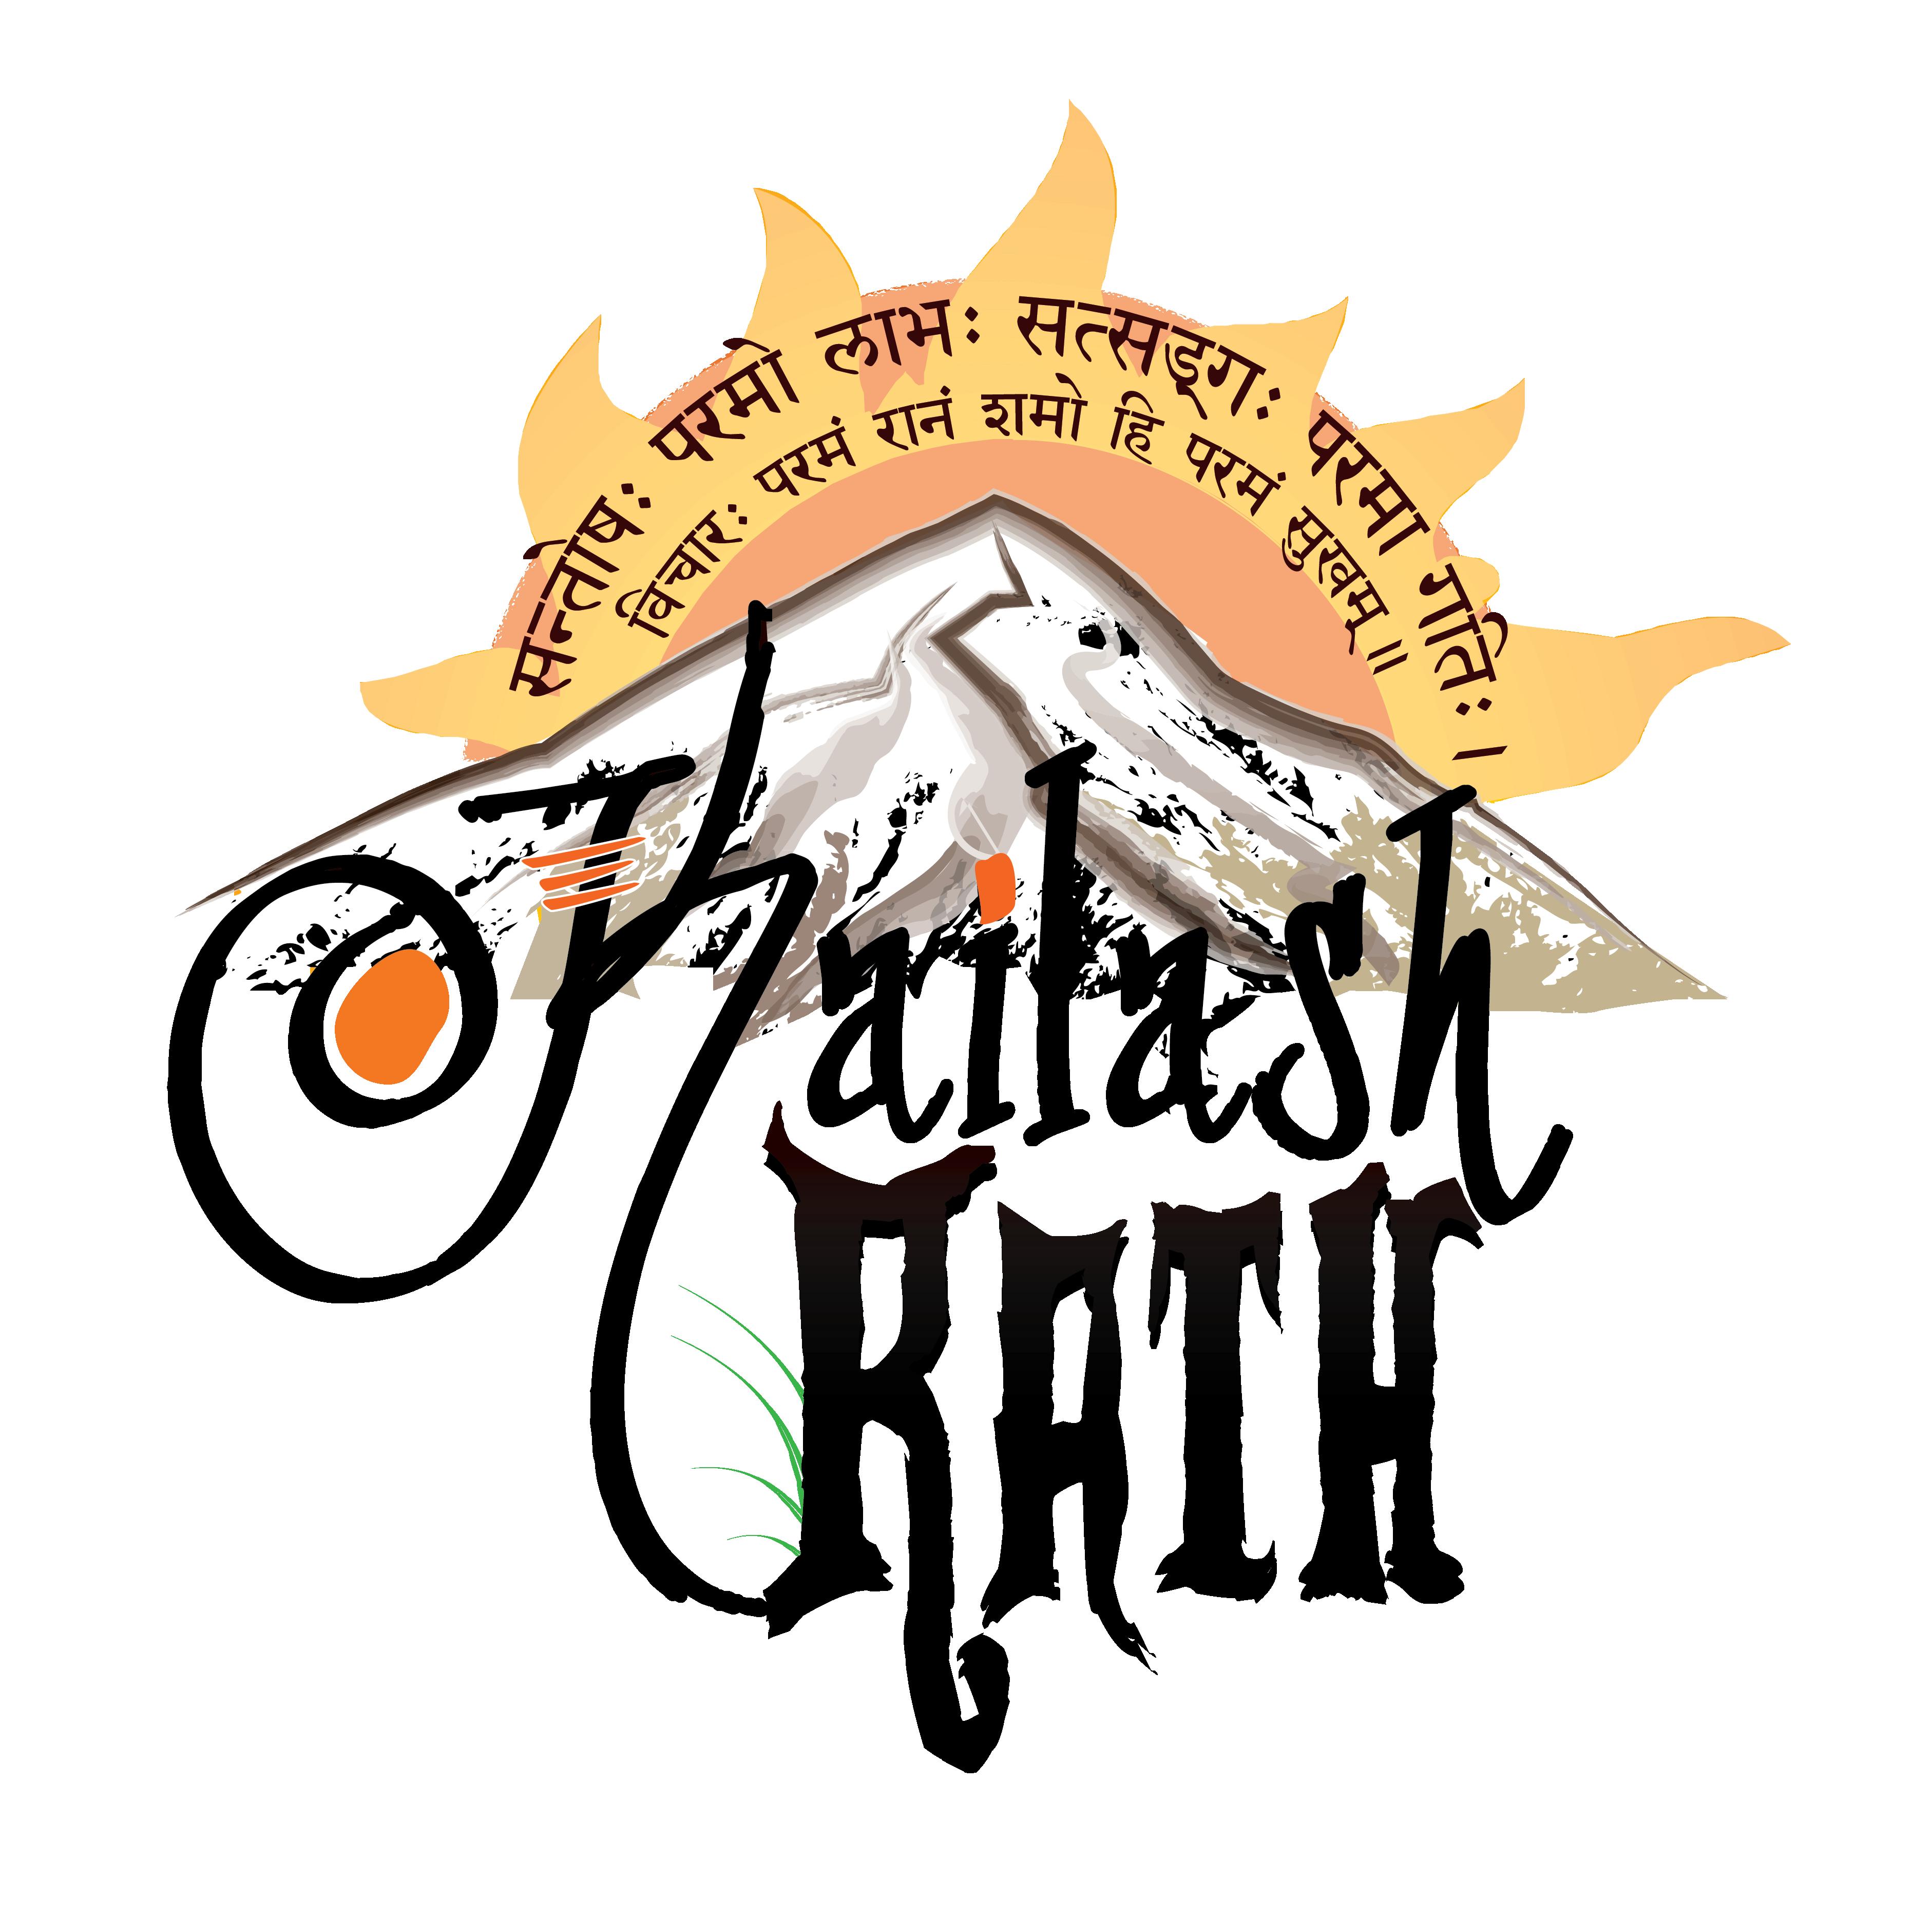 Kailash r rath eco. Hike clipart trekker